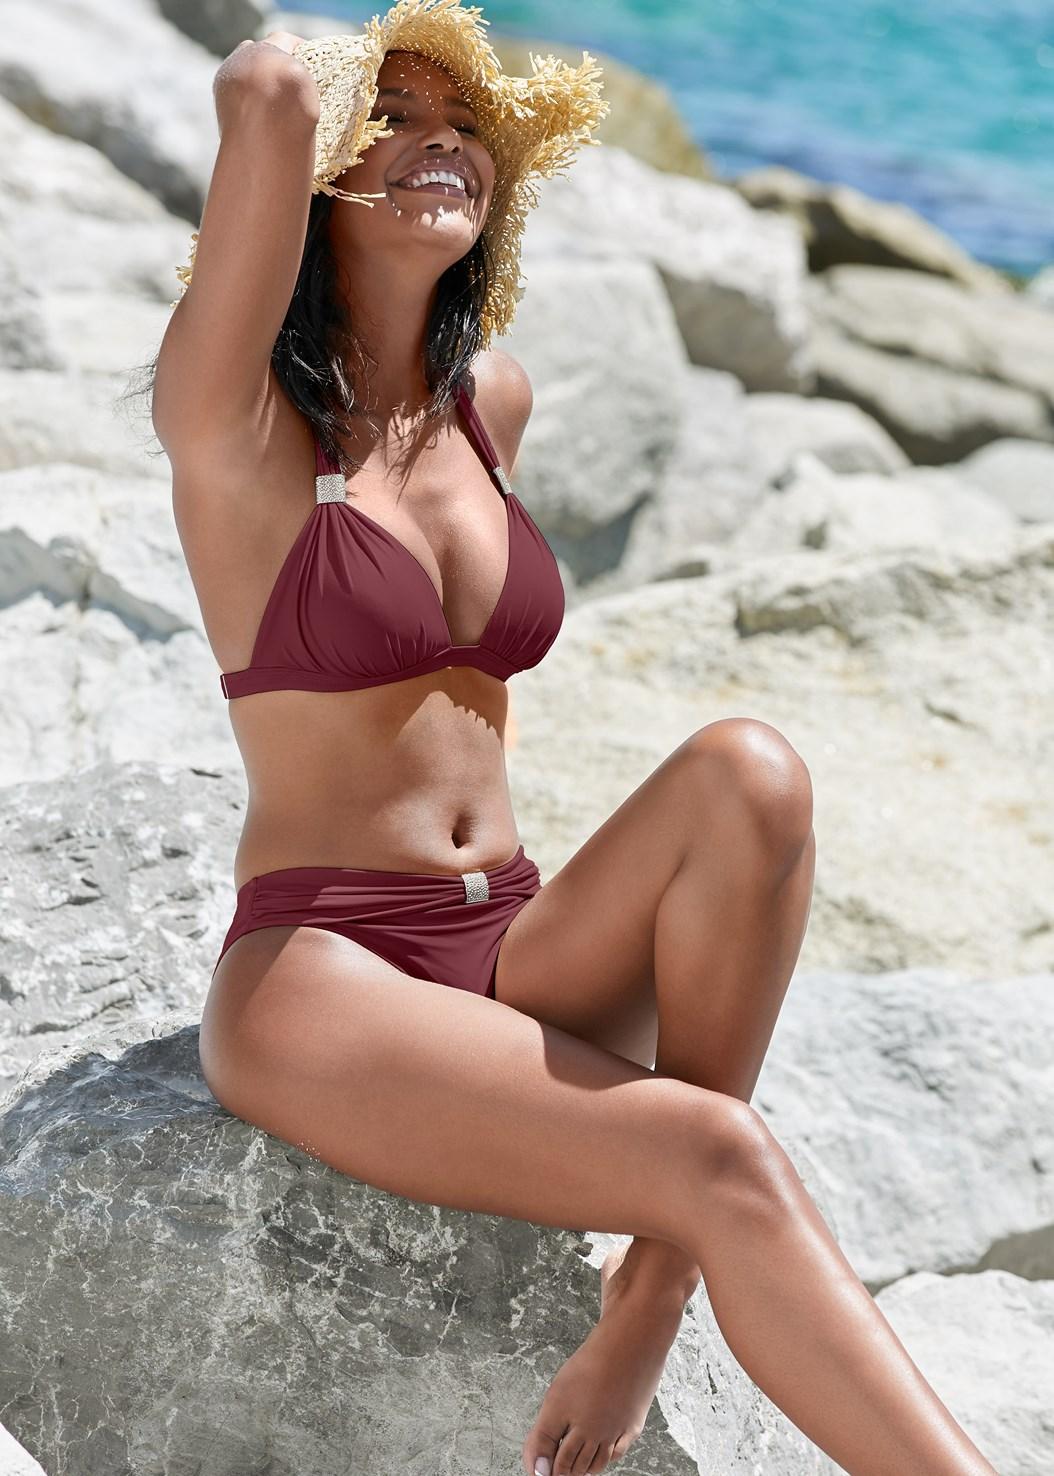 Goddess Midrise Bottom,Goddess Enhancer Push Up Halter Top,Triangle String Bikini Top,Lovely Lift Wrap Bikini Top